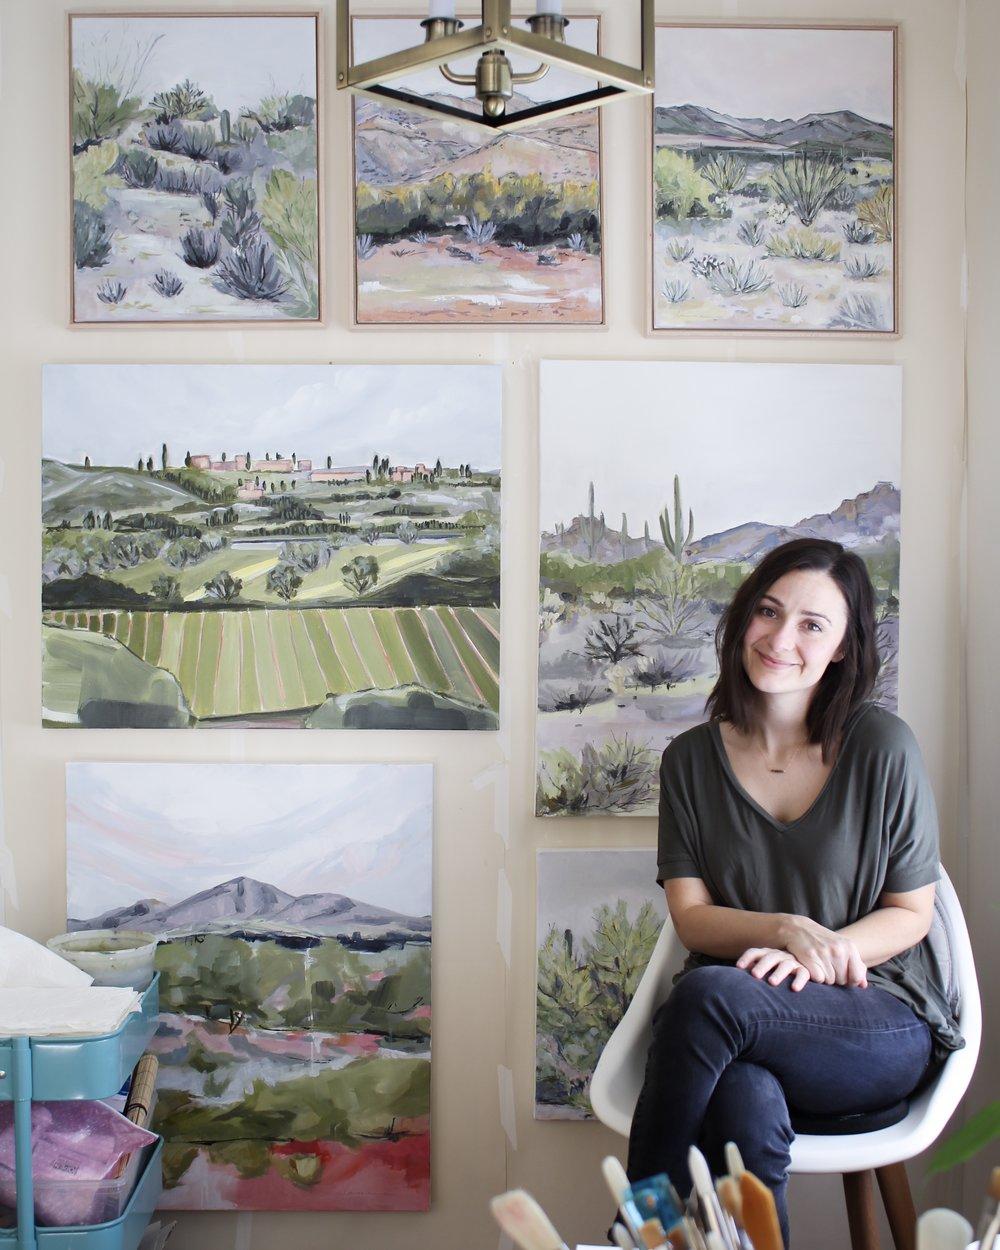 Laurie Anne Art La in kitchen studio